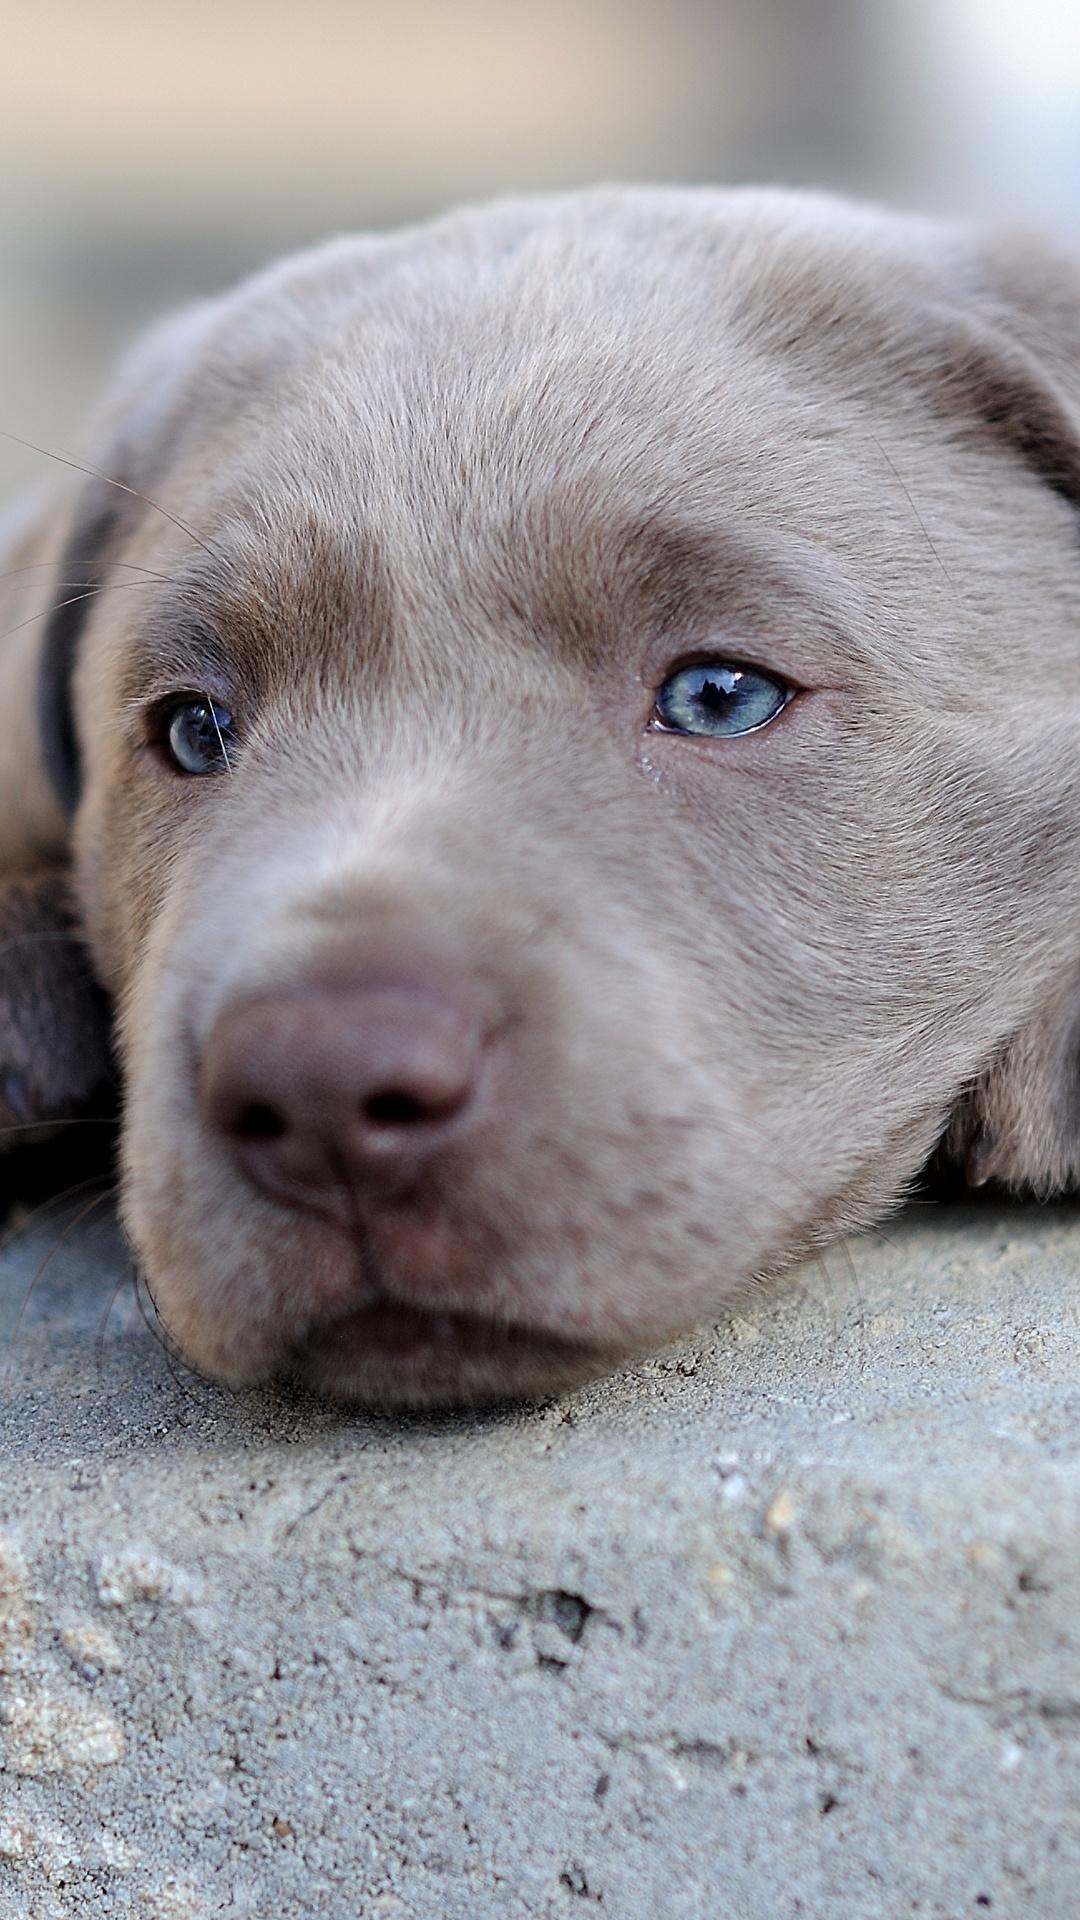 Fotos Welpe Retriever Labrador Retriever Hunde Grau Schnauze Kopf Tiere 1080x1920 für Handy